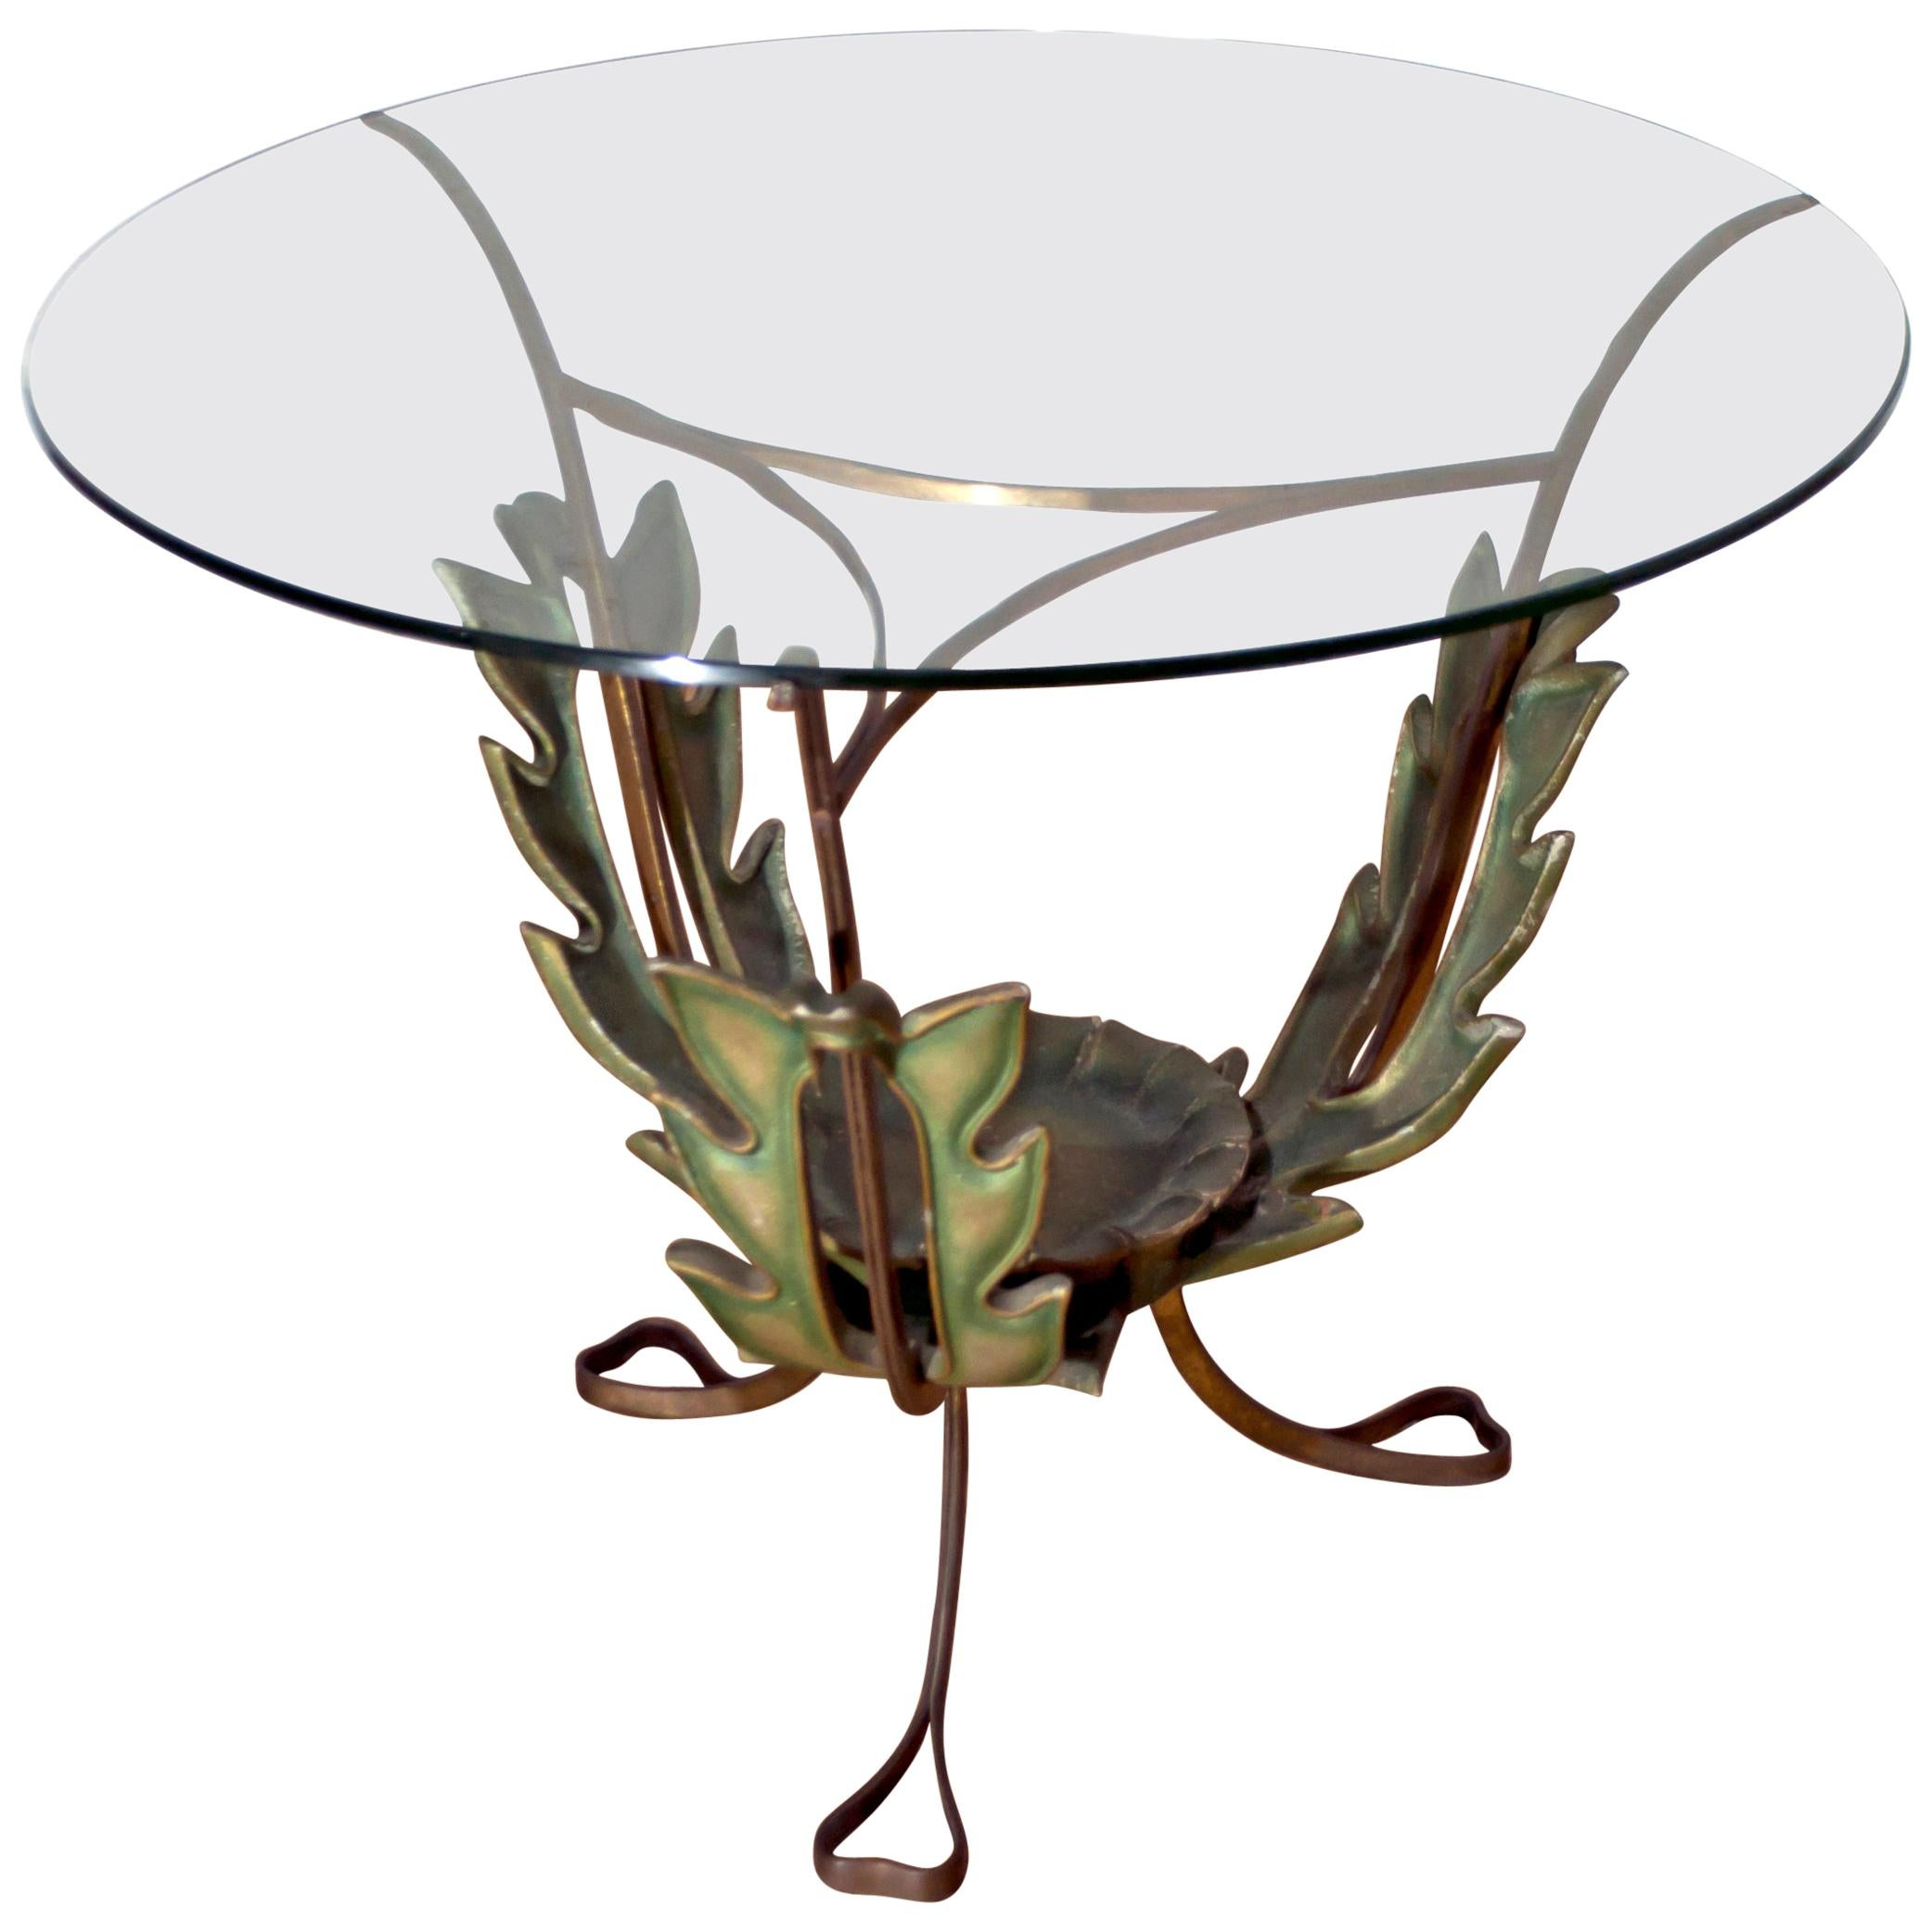 Pierluigi Colli Midcentury Italian Brass and Wood Coffee Table, 1950s